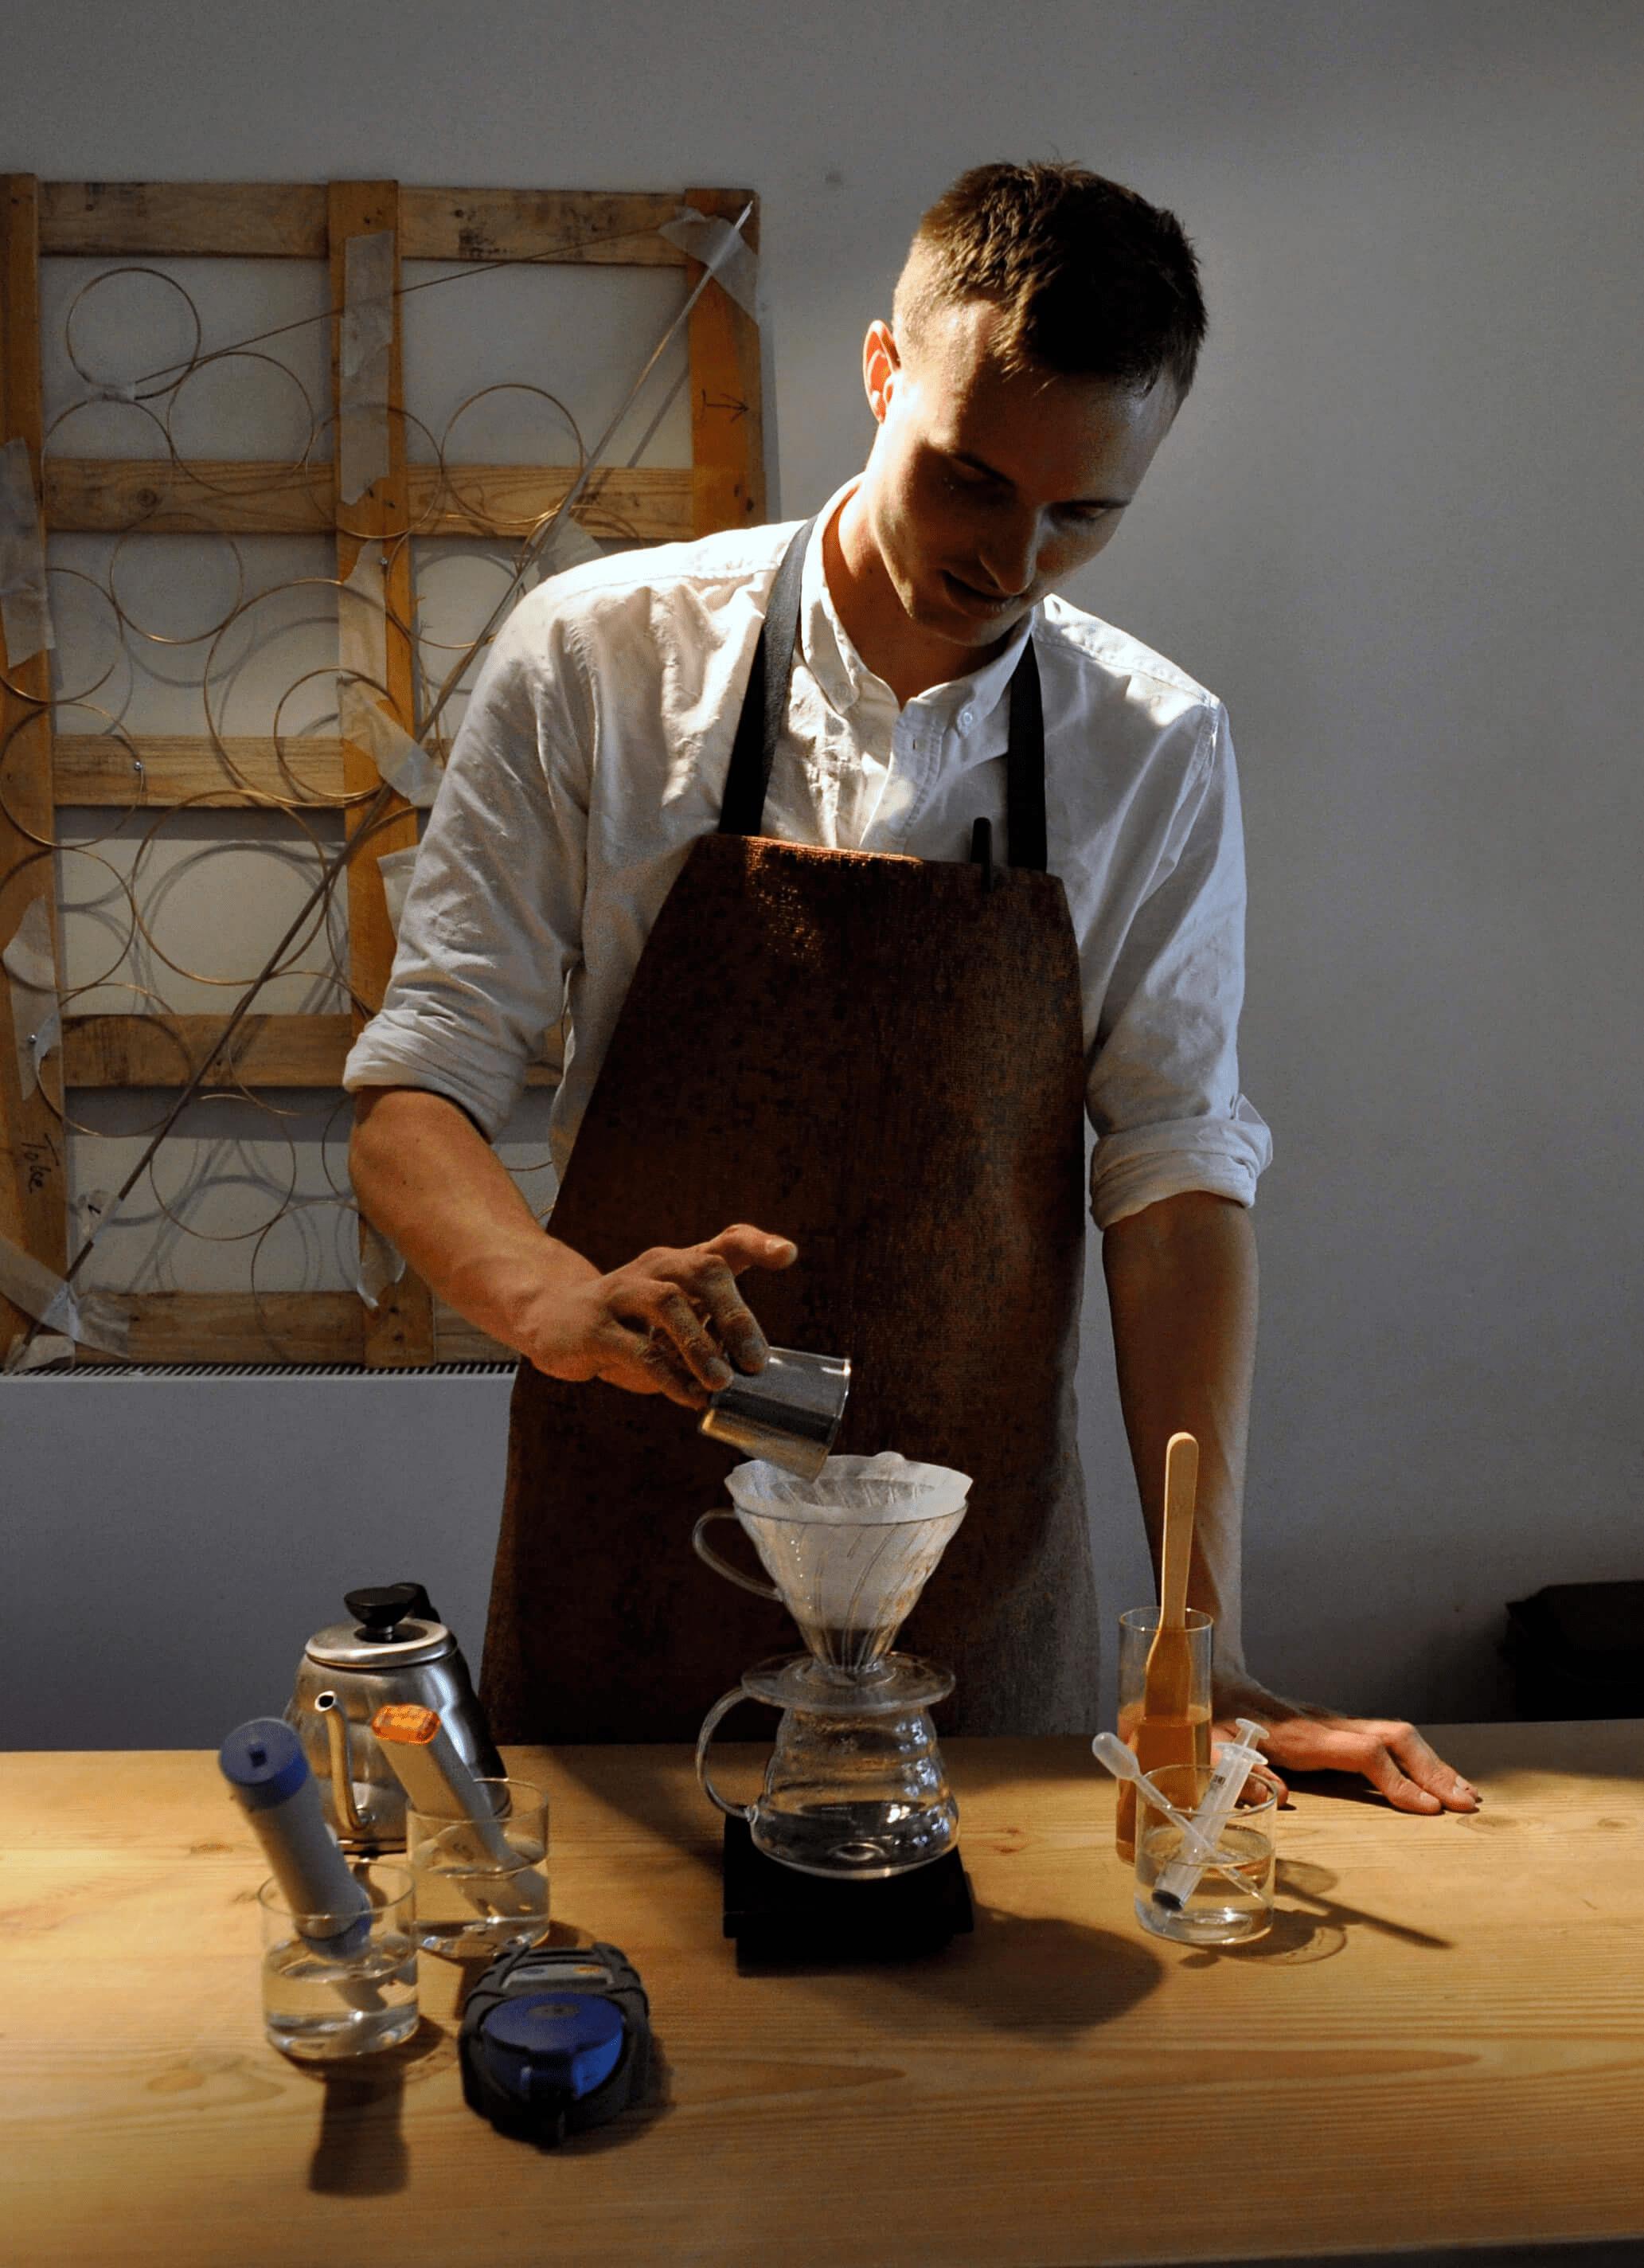 Billy regnskabsprogram testimonial Prolog Kaffebar